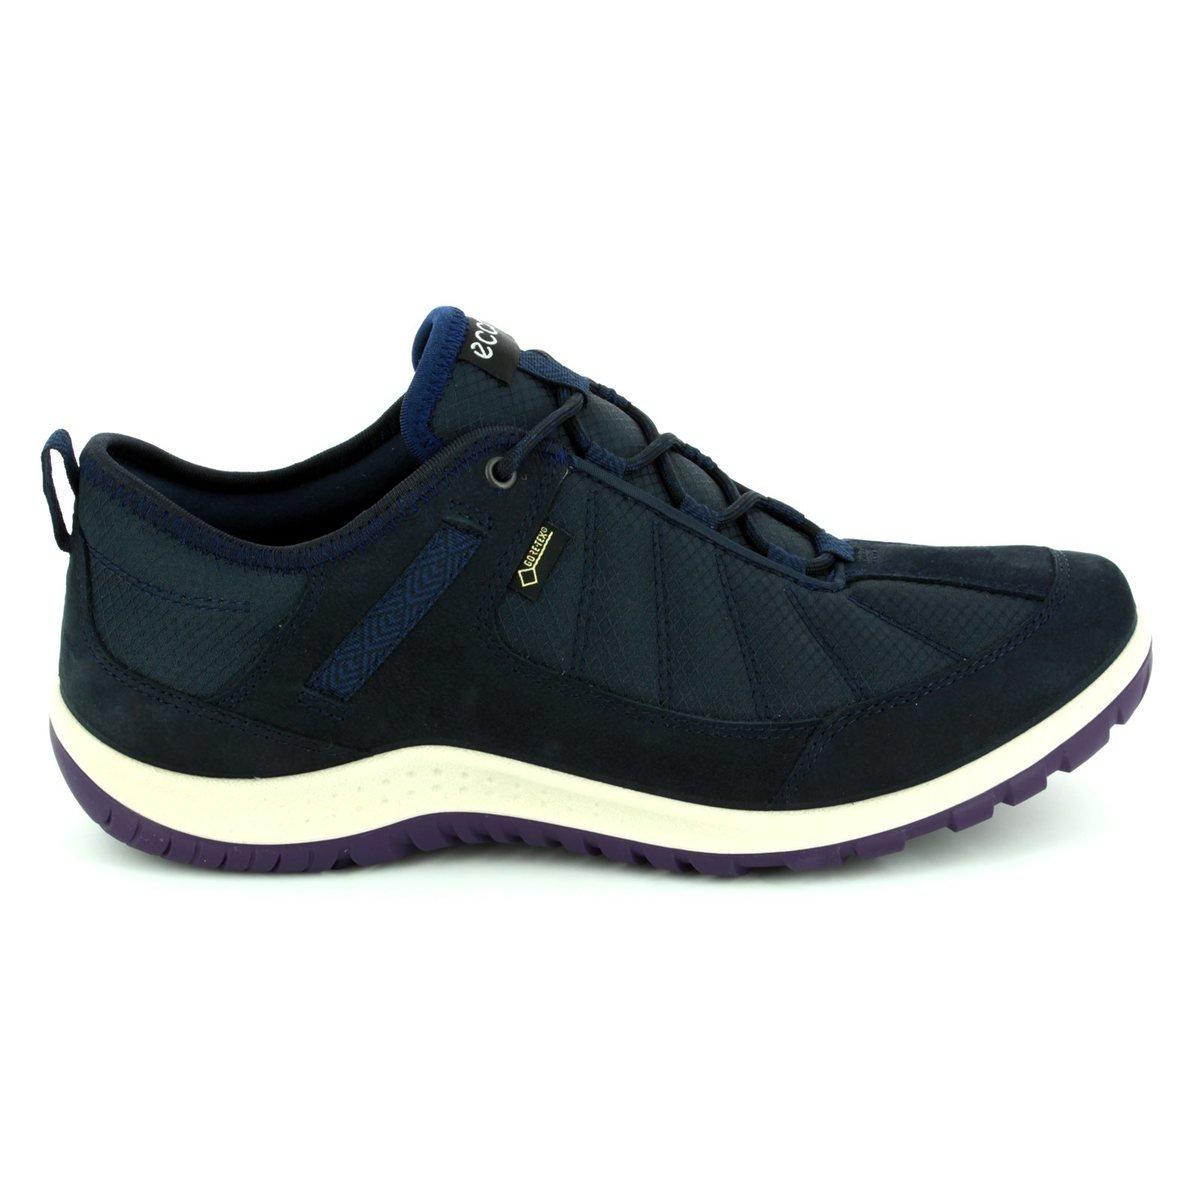 e542fb77df2 ECCO Women's Aspina Low Gore-tex Textile Hiking Shoe - UKsportsOutdoors